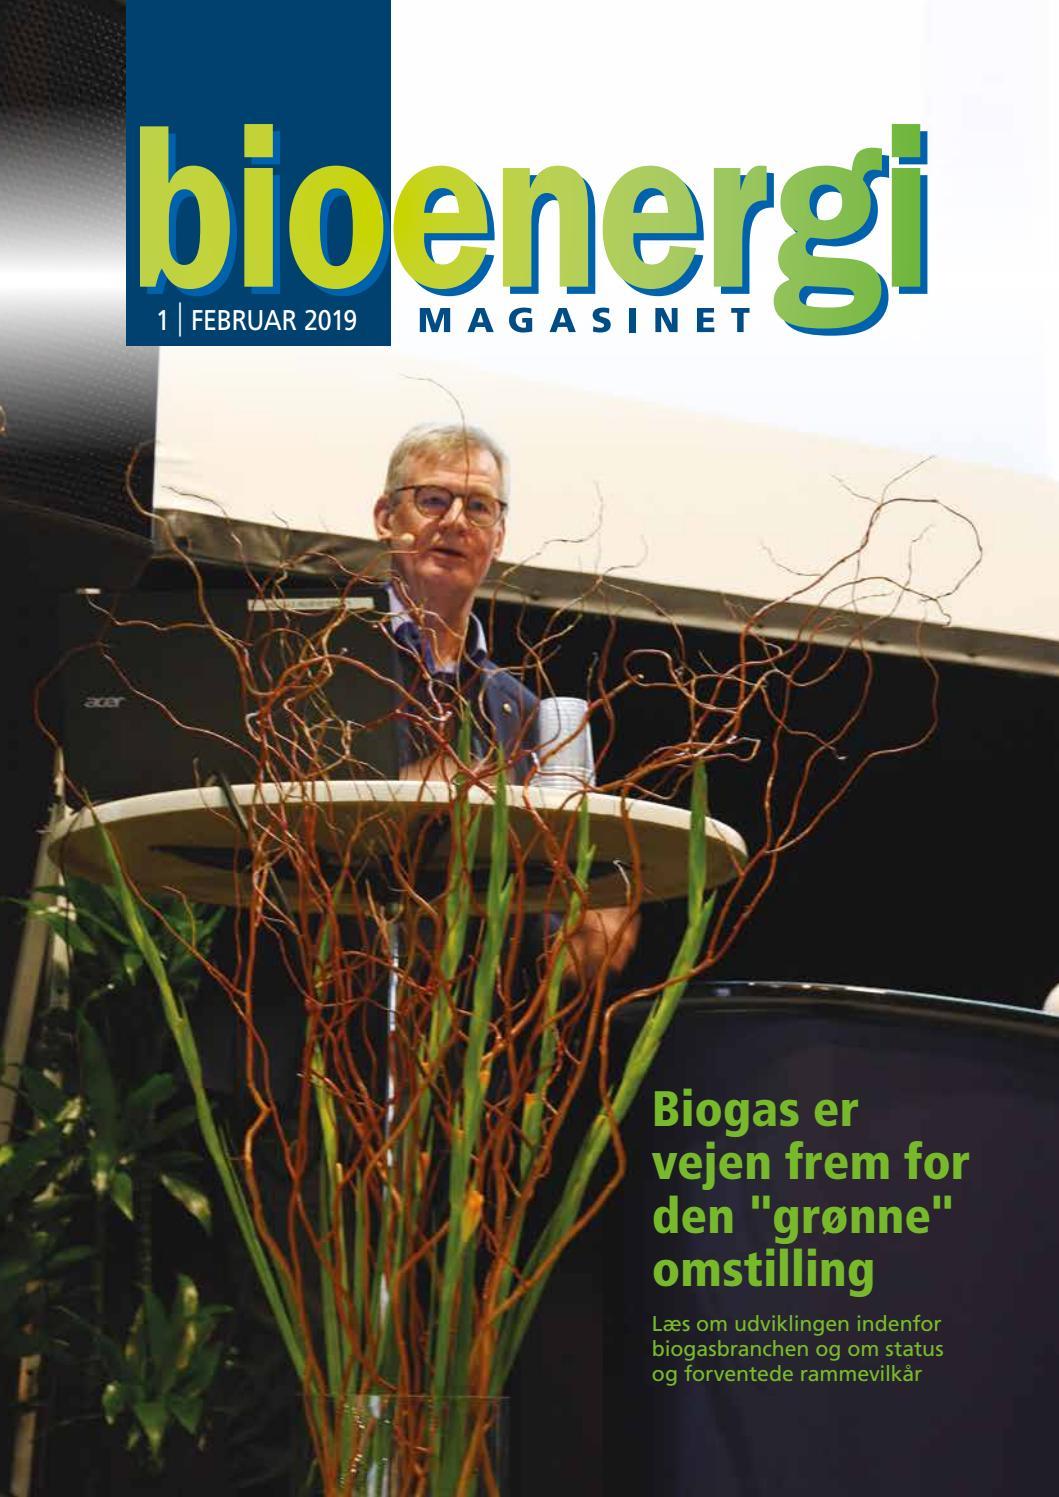 verdens bioenergi matchmaking